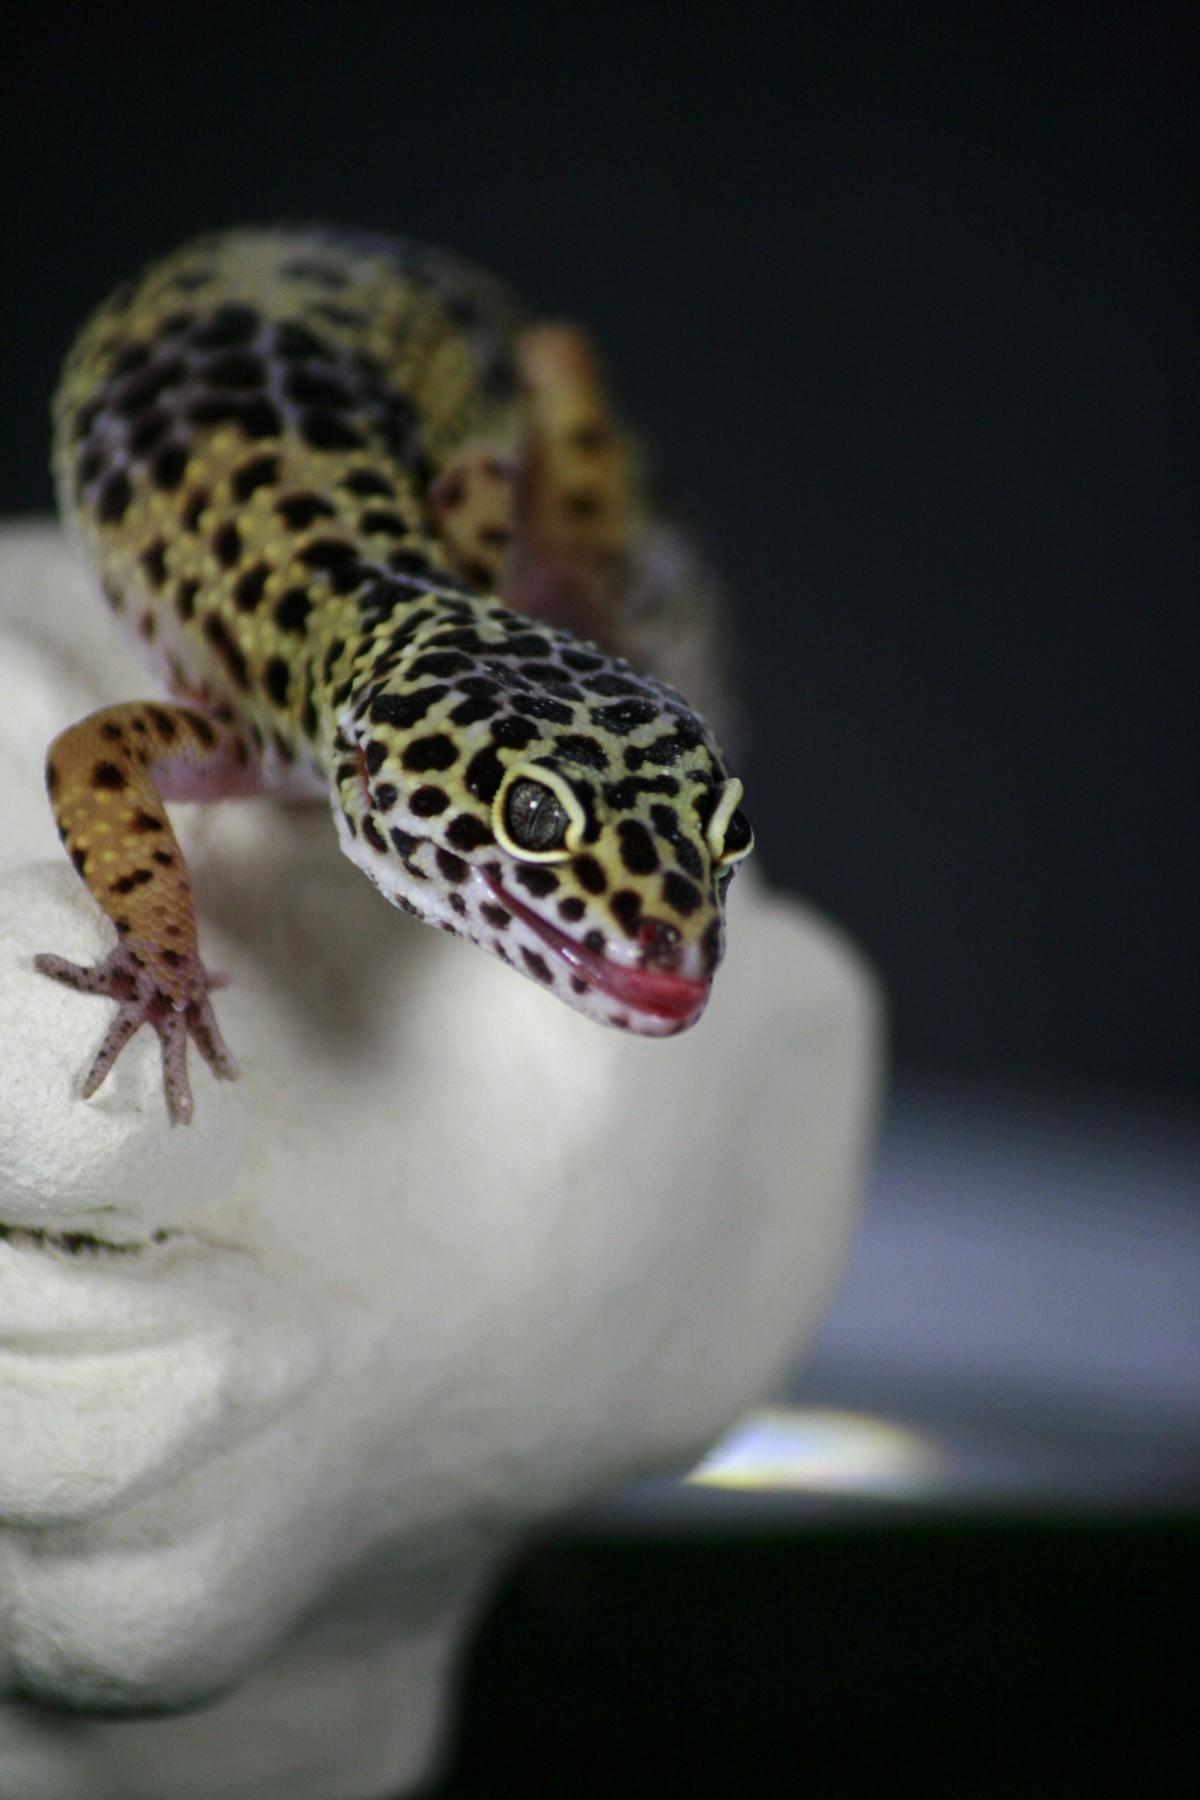 free images hand finger eat fauna lizard gecko close up